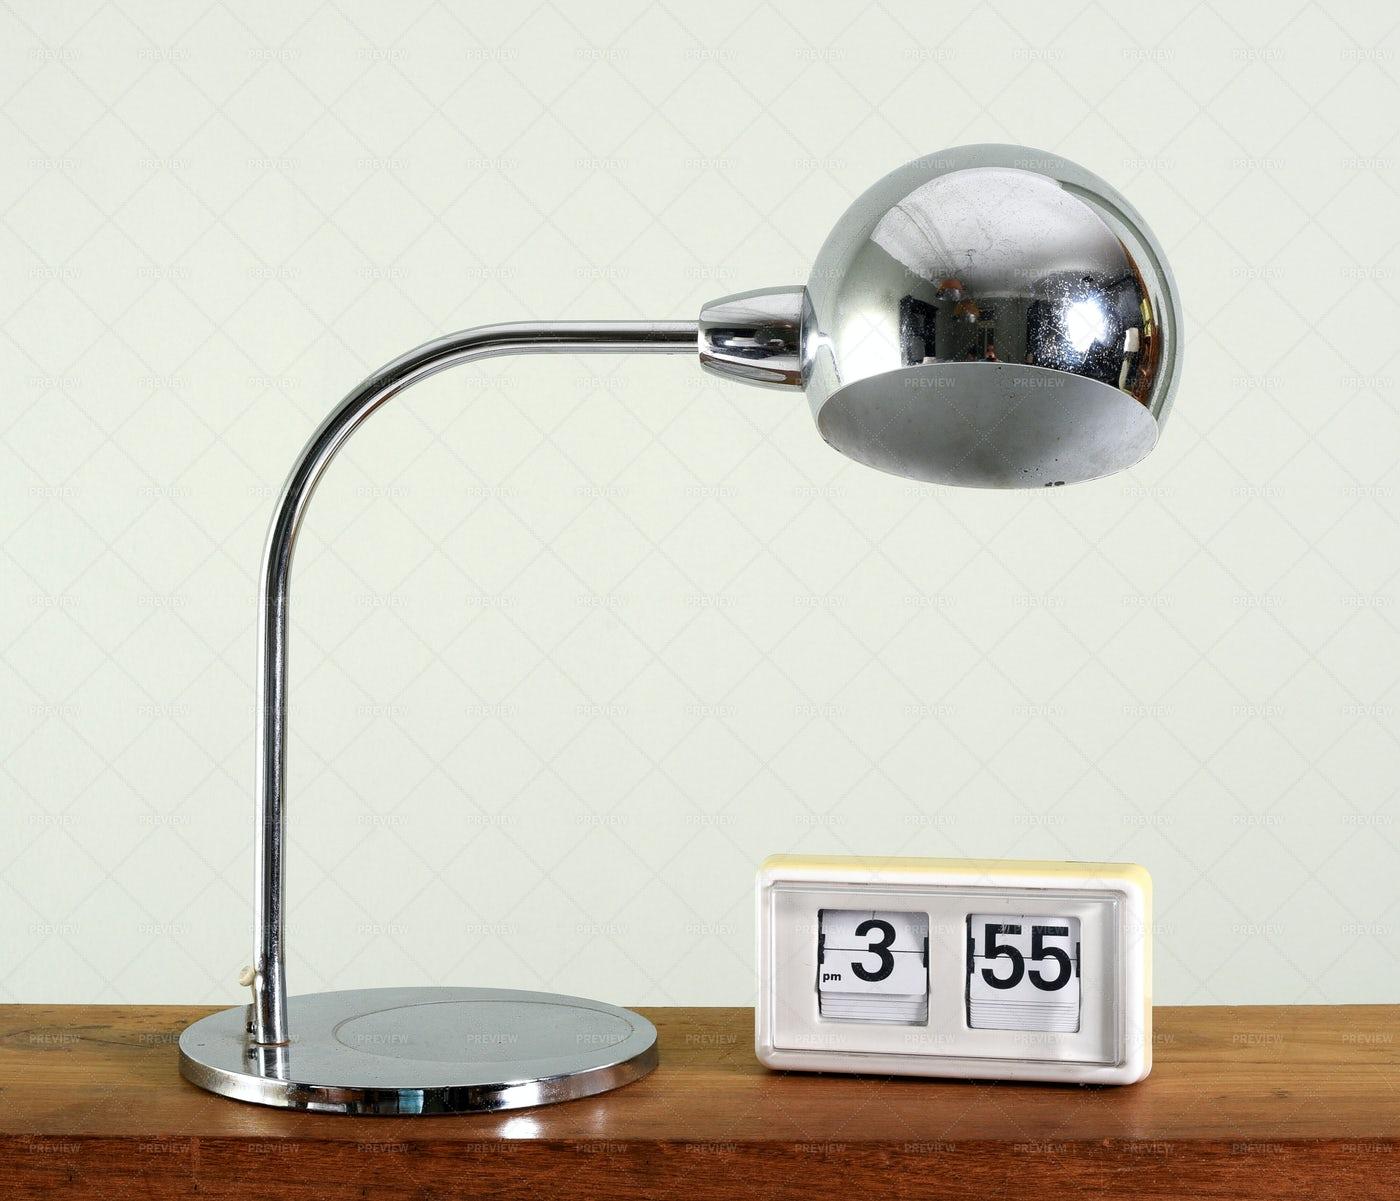 Retro Chrome Table Lamp And Flip Clock: Stock Photos